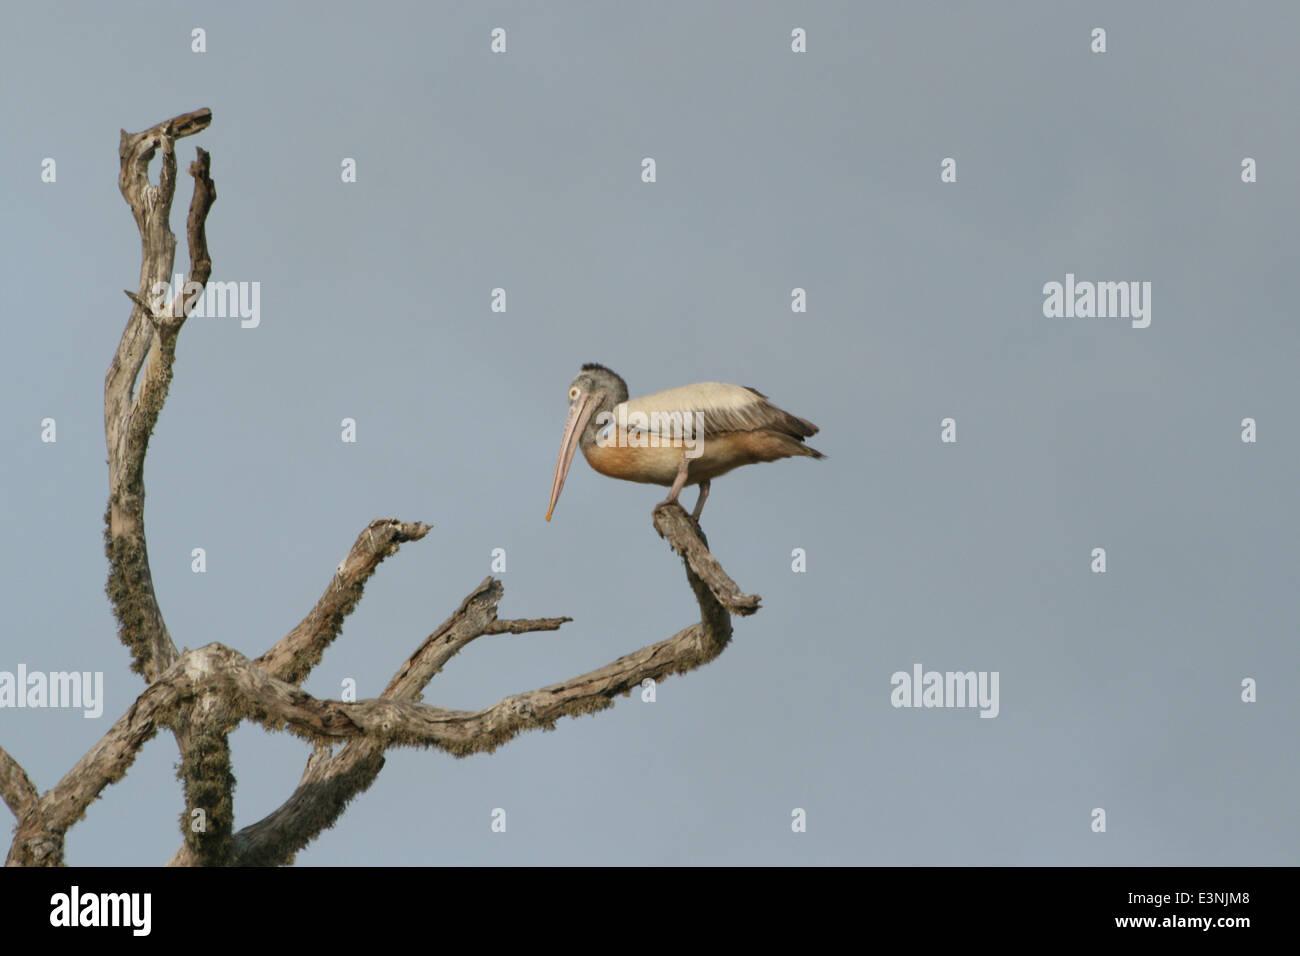 Pelikan auf dem Baum - Stock Image